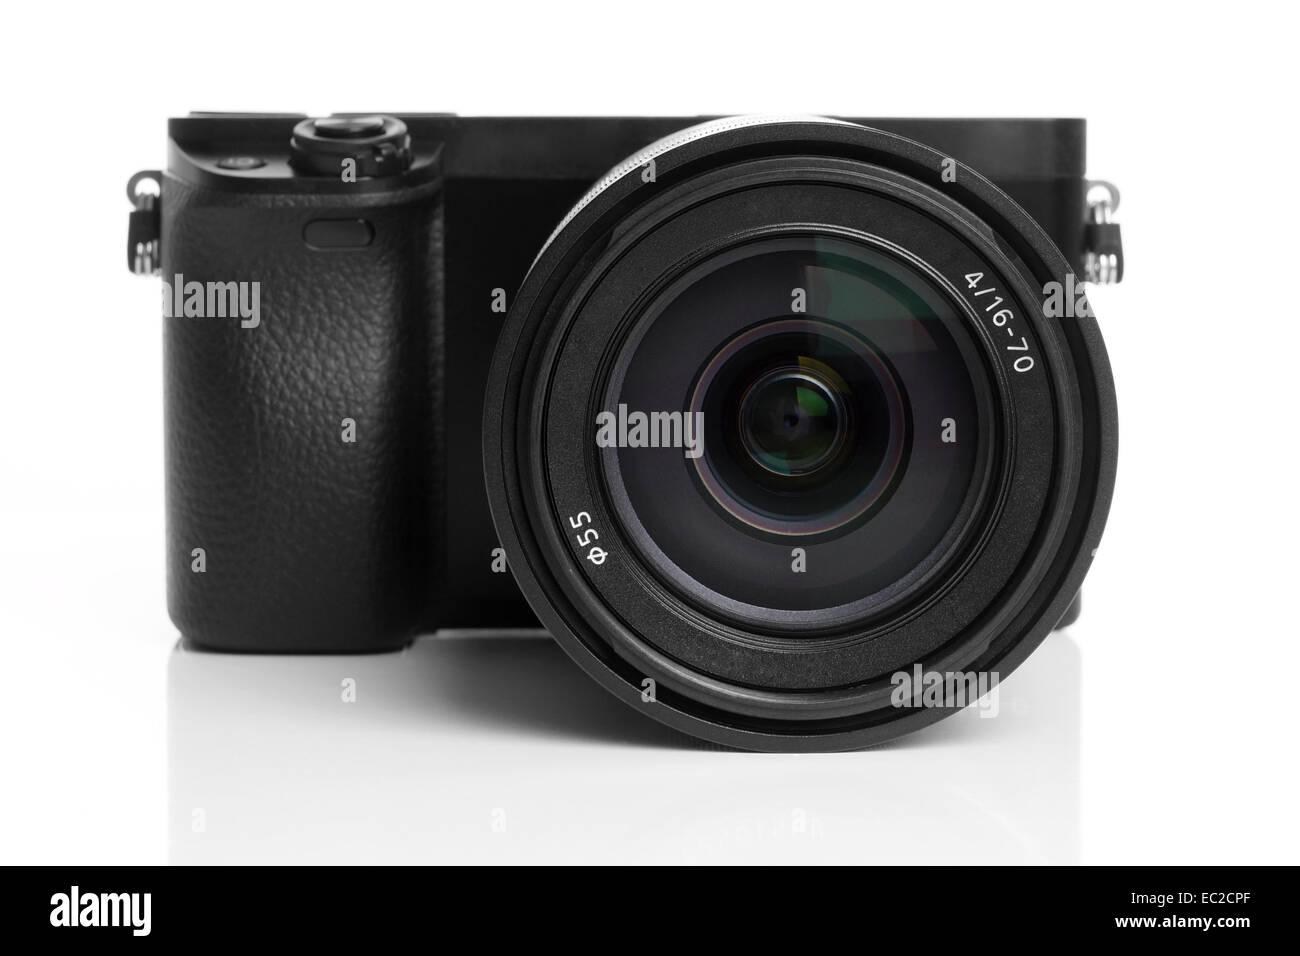 mirrorless digital camera - Stock Image